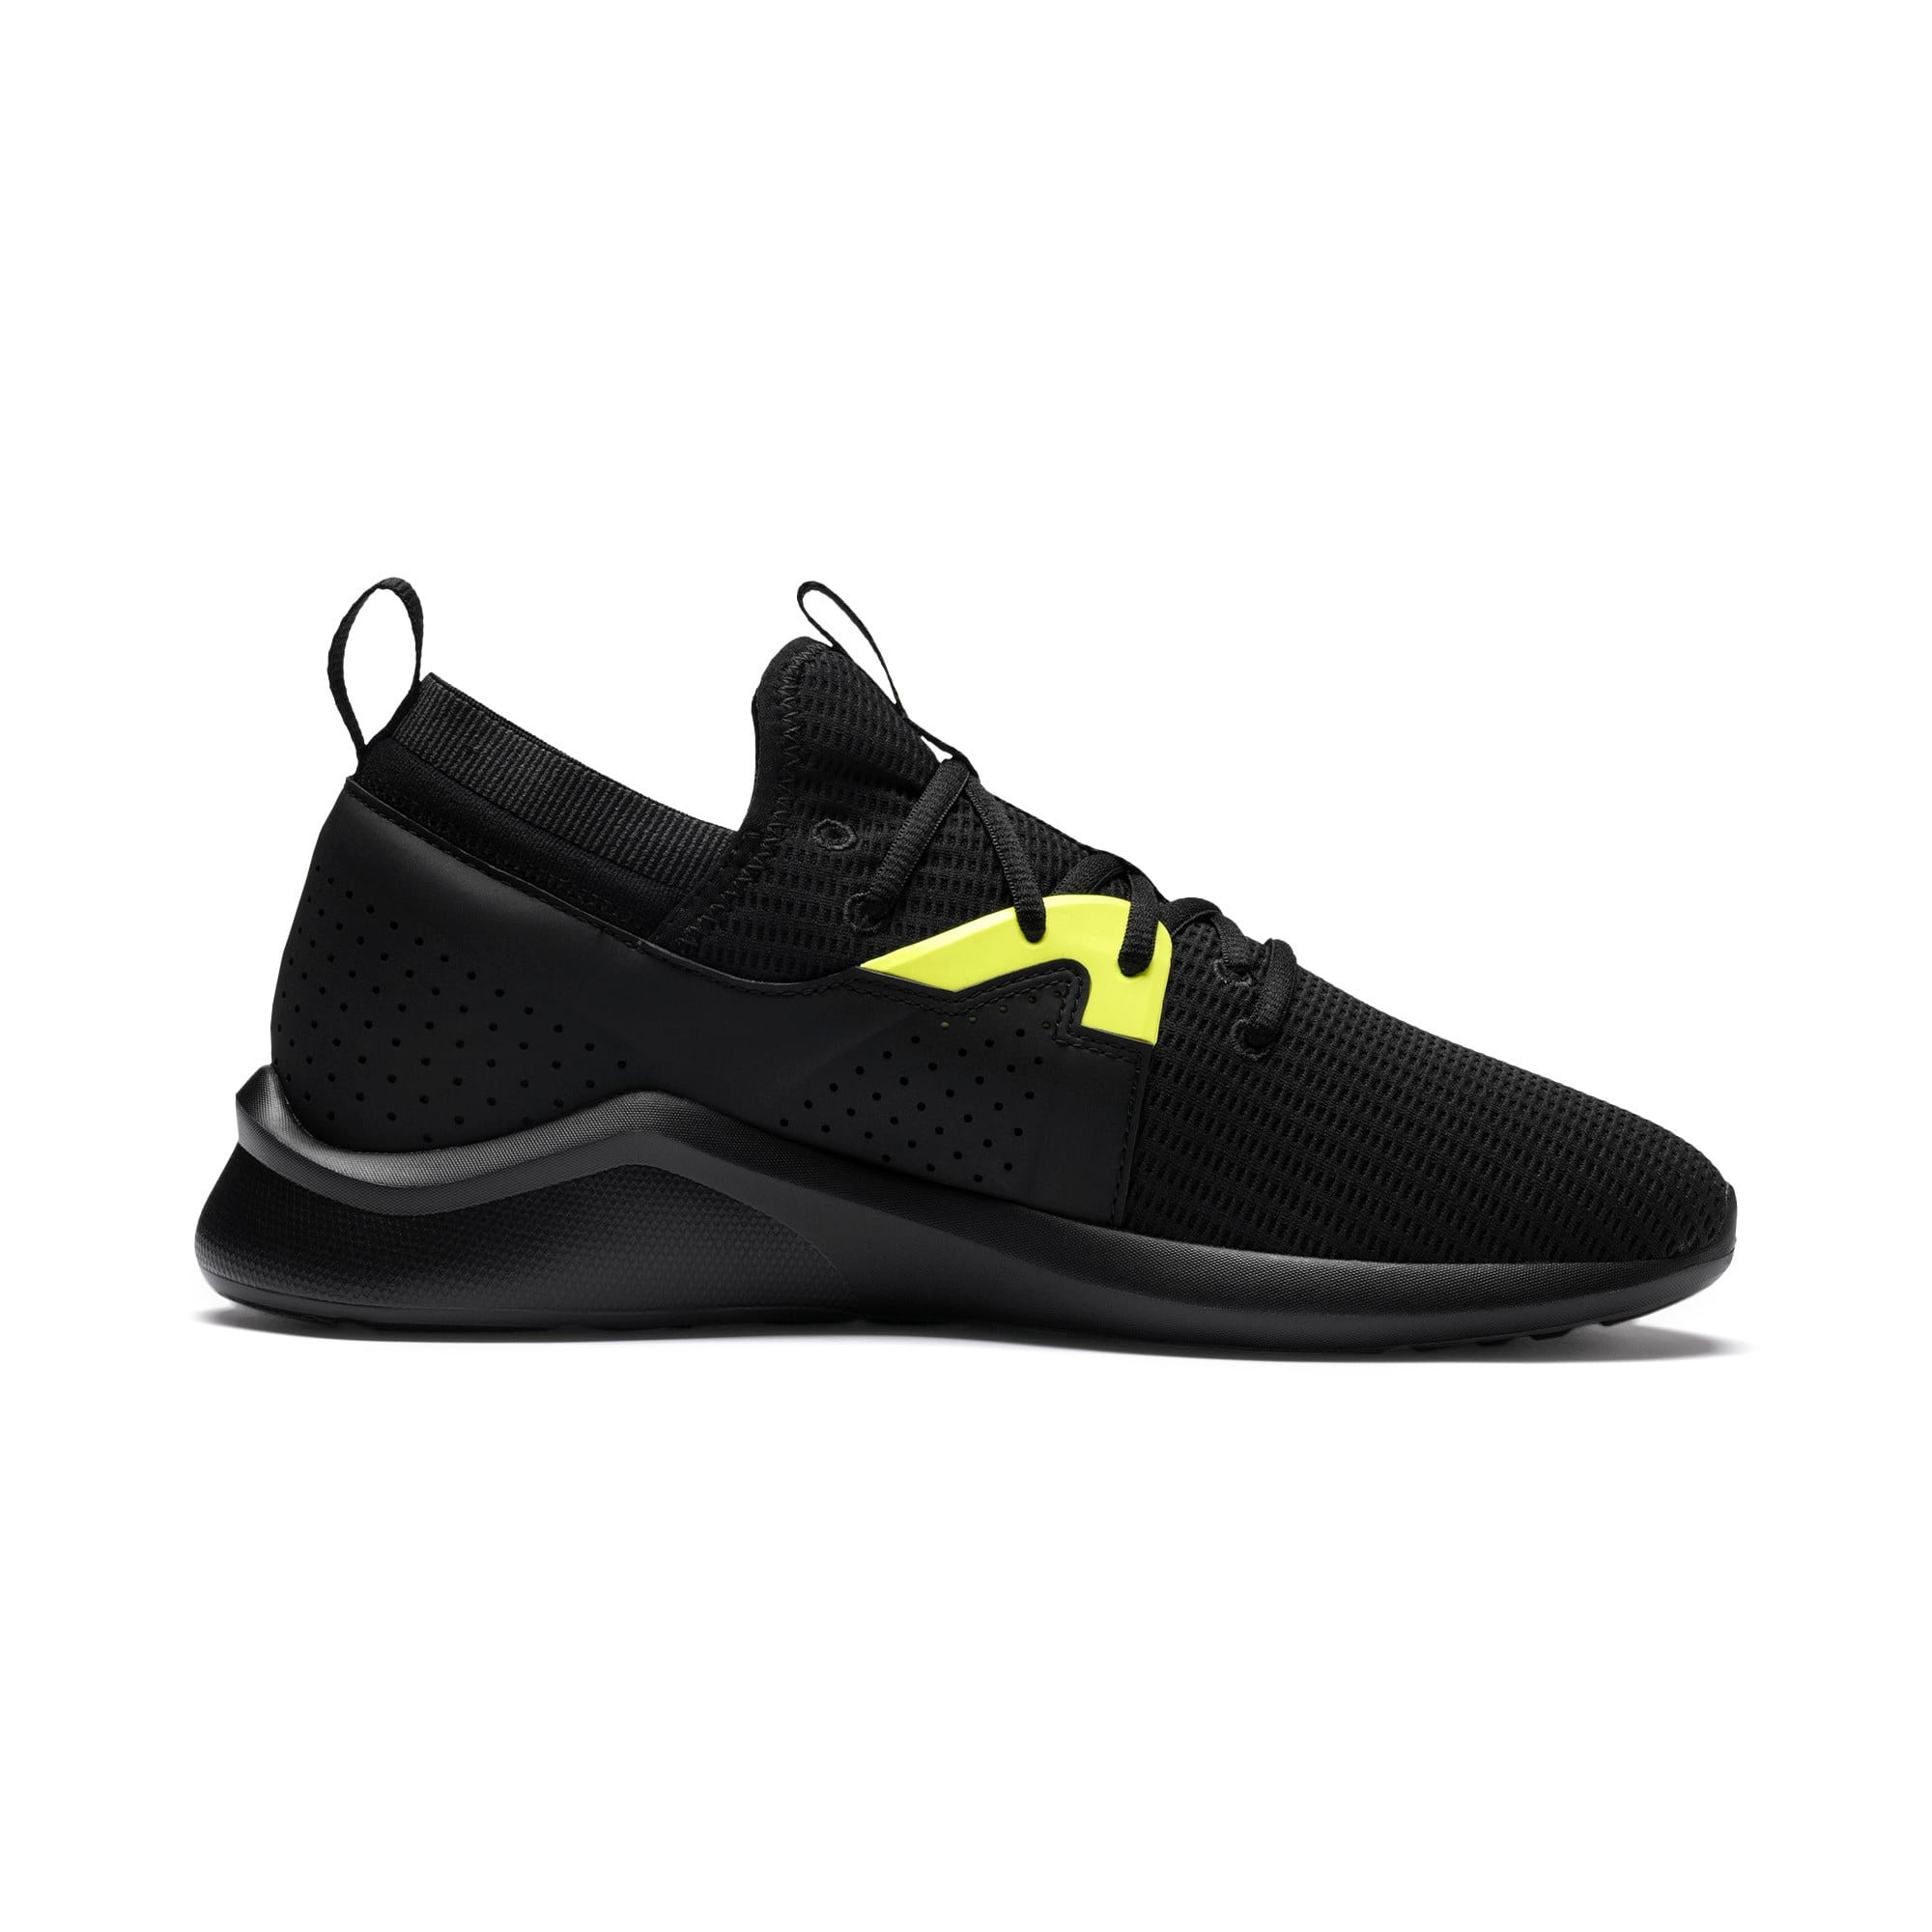 Thumbnail 5 of Emergence Future Men's Training Shoes, Black-Charcoal-Yellow, medium